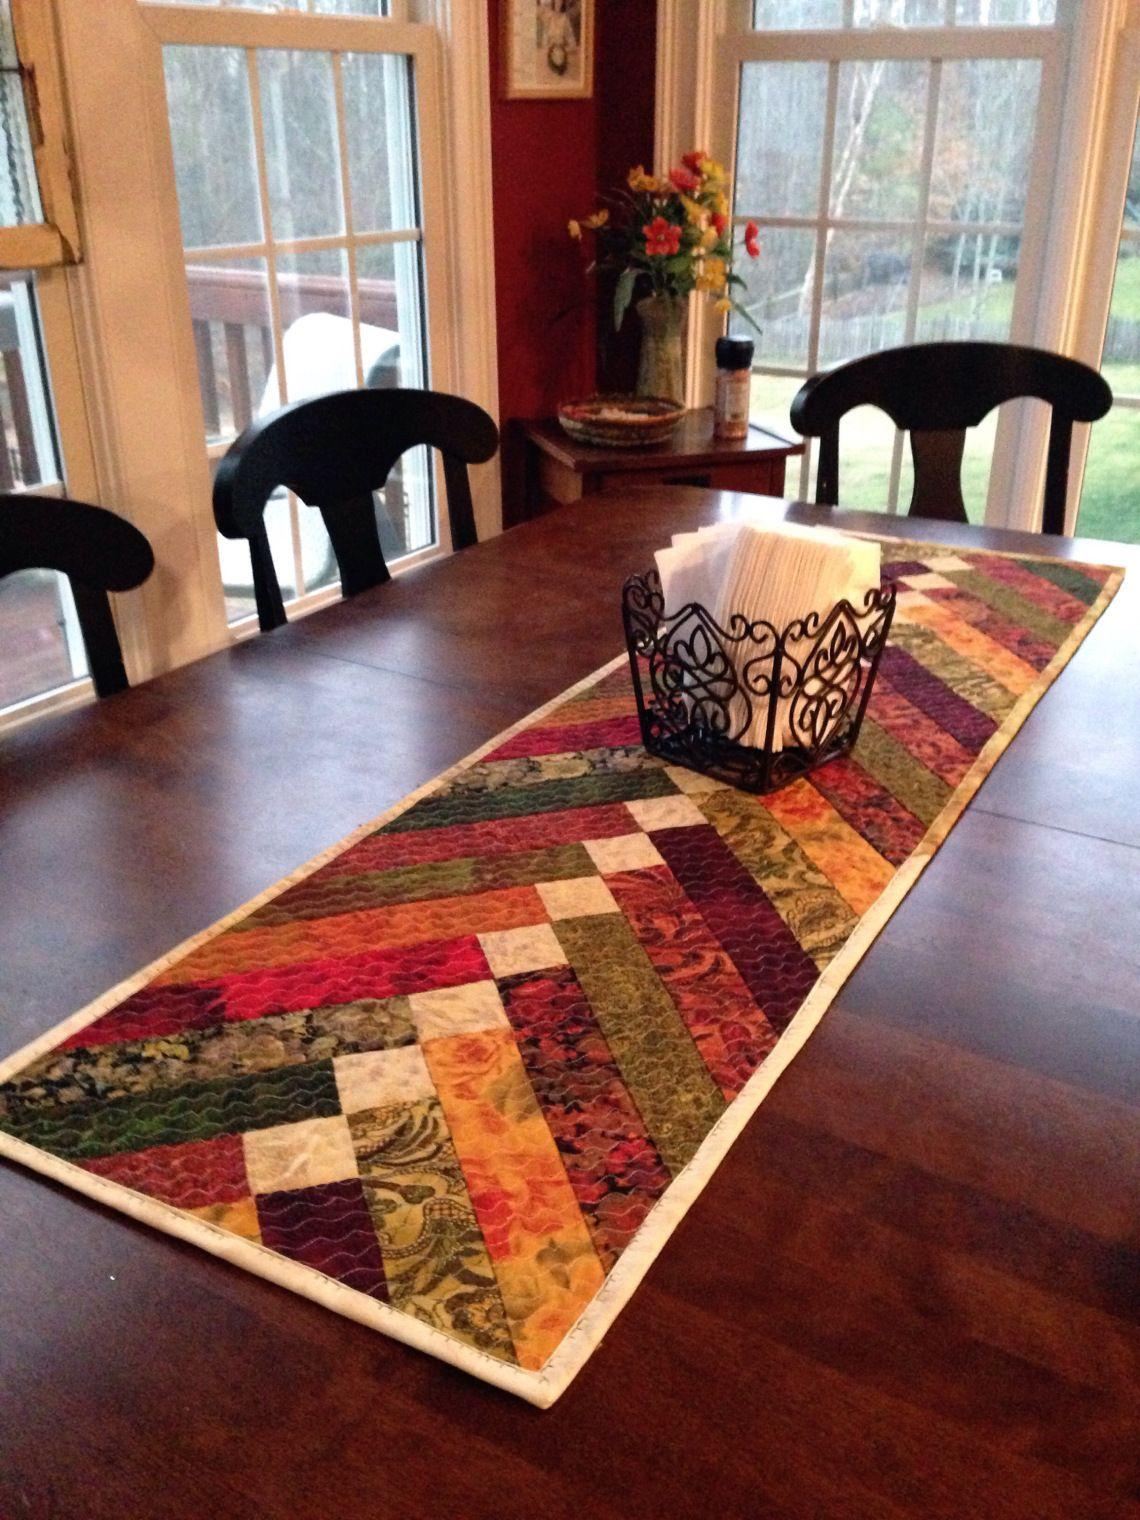 French Braid Table Runner Pattern : french, braid, table, runner, pattern, French, Braid, Table, Runner, Patchwork, Runner,, Quilted, Runners, Patterns,, Pattern